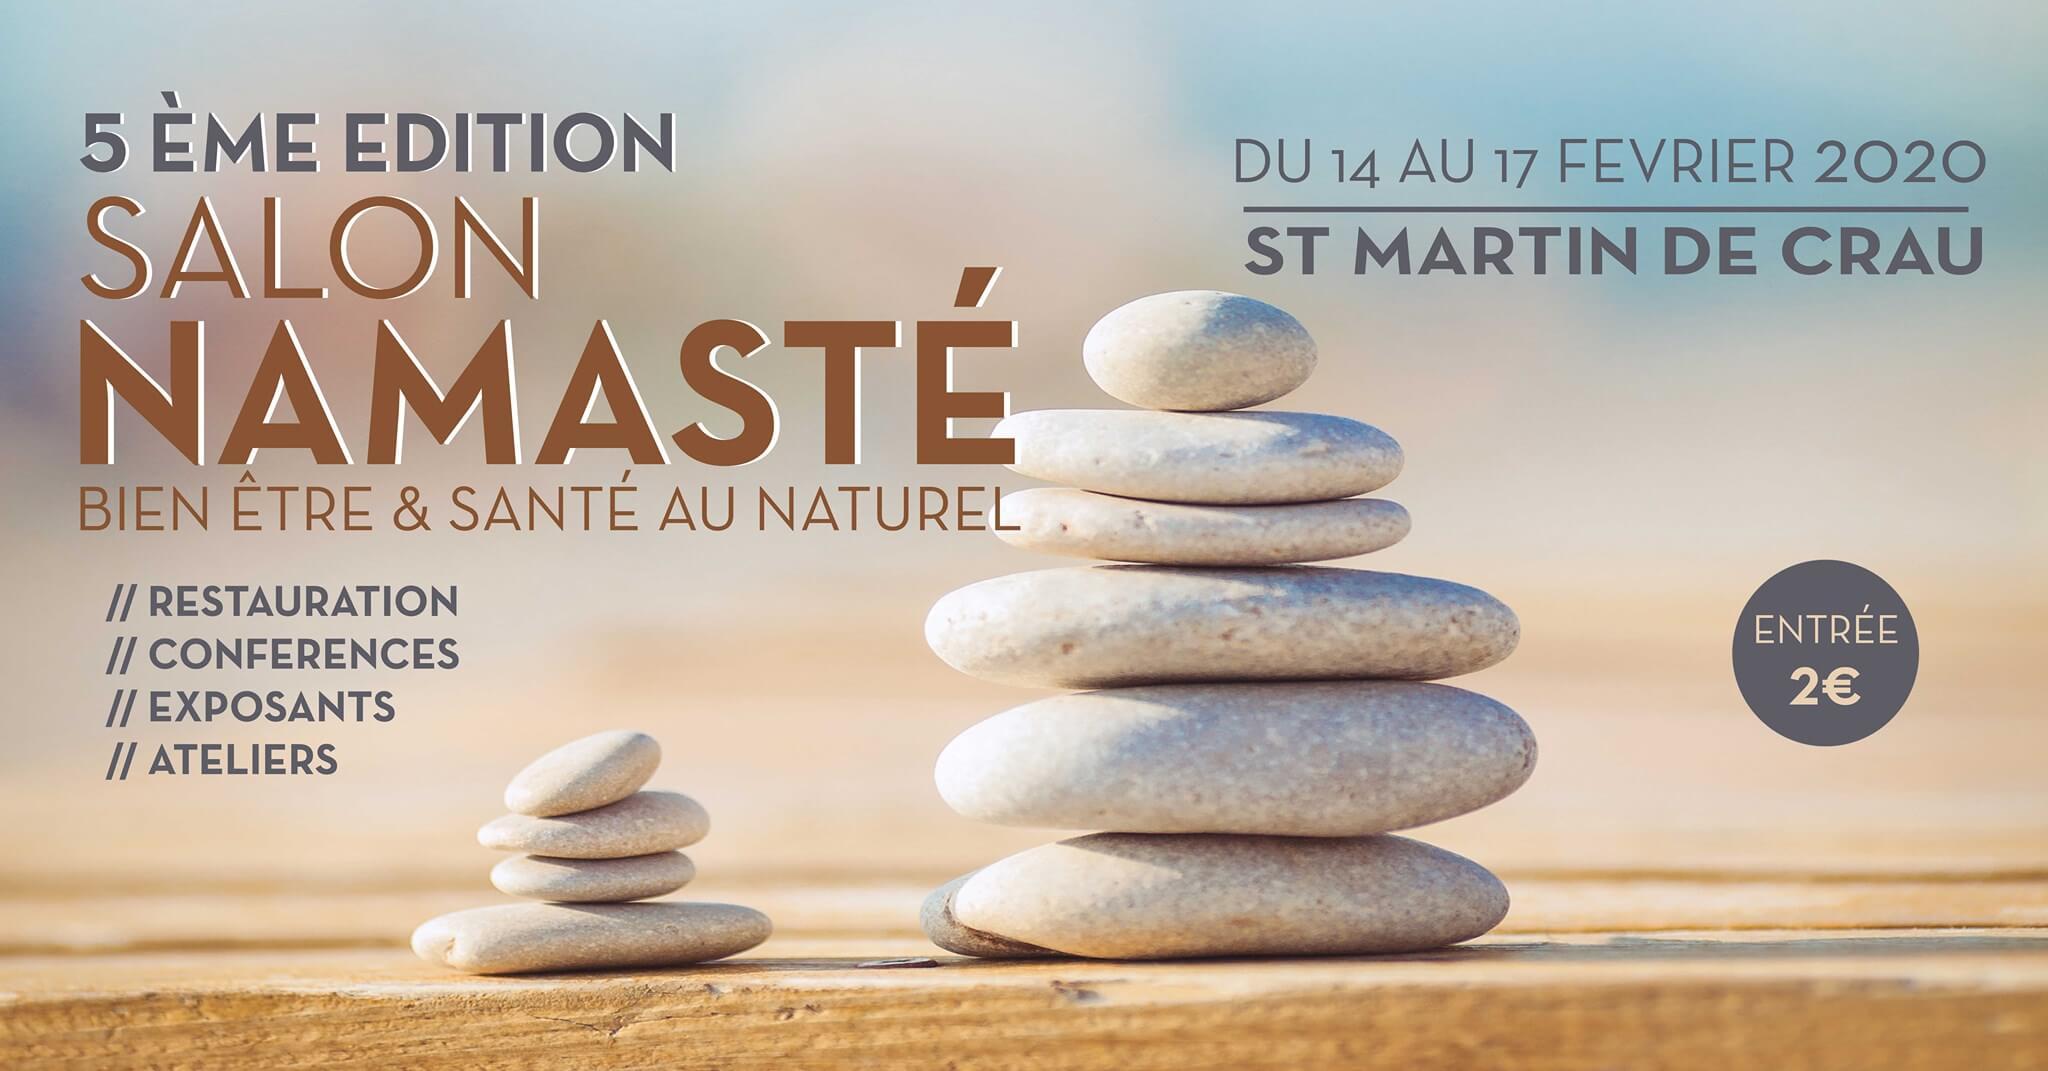 salon namaste 2020 bien etre saint martin de crau